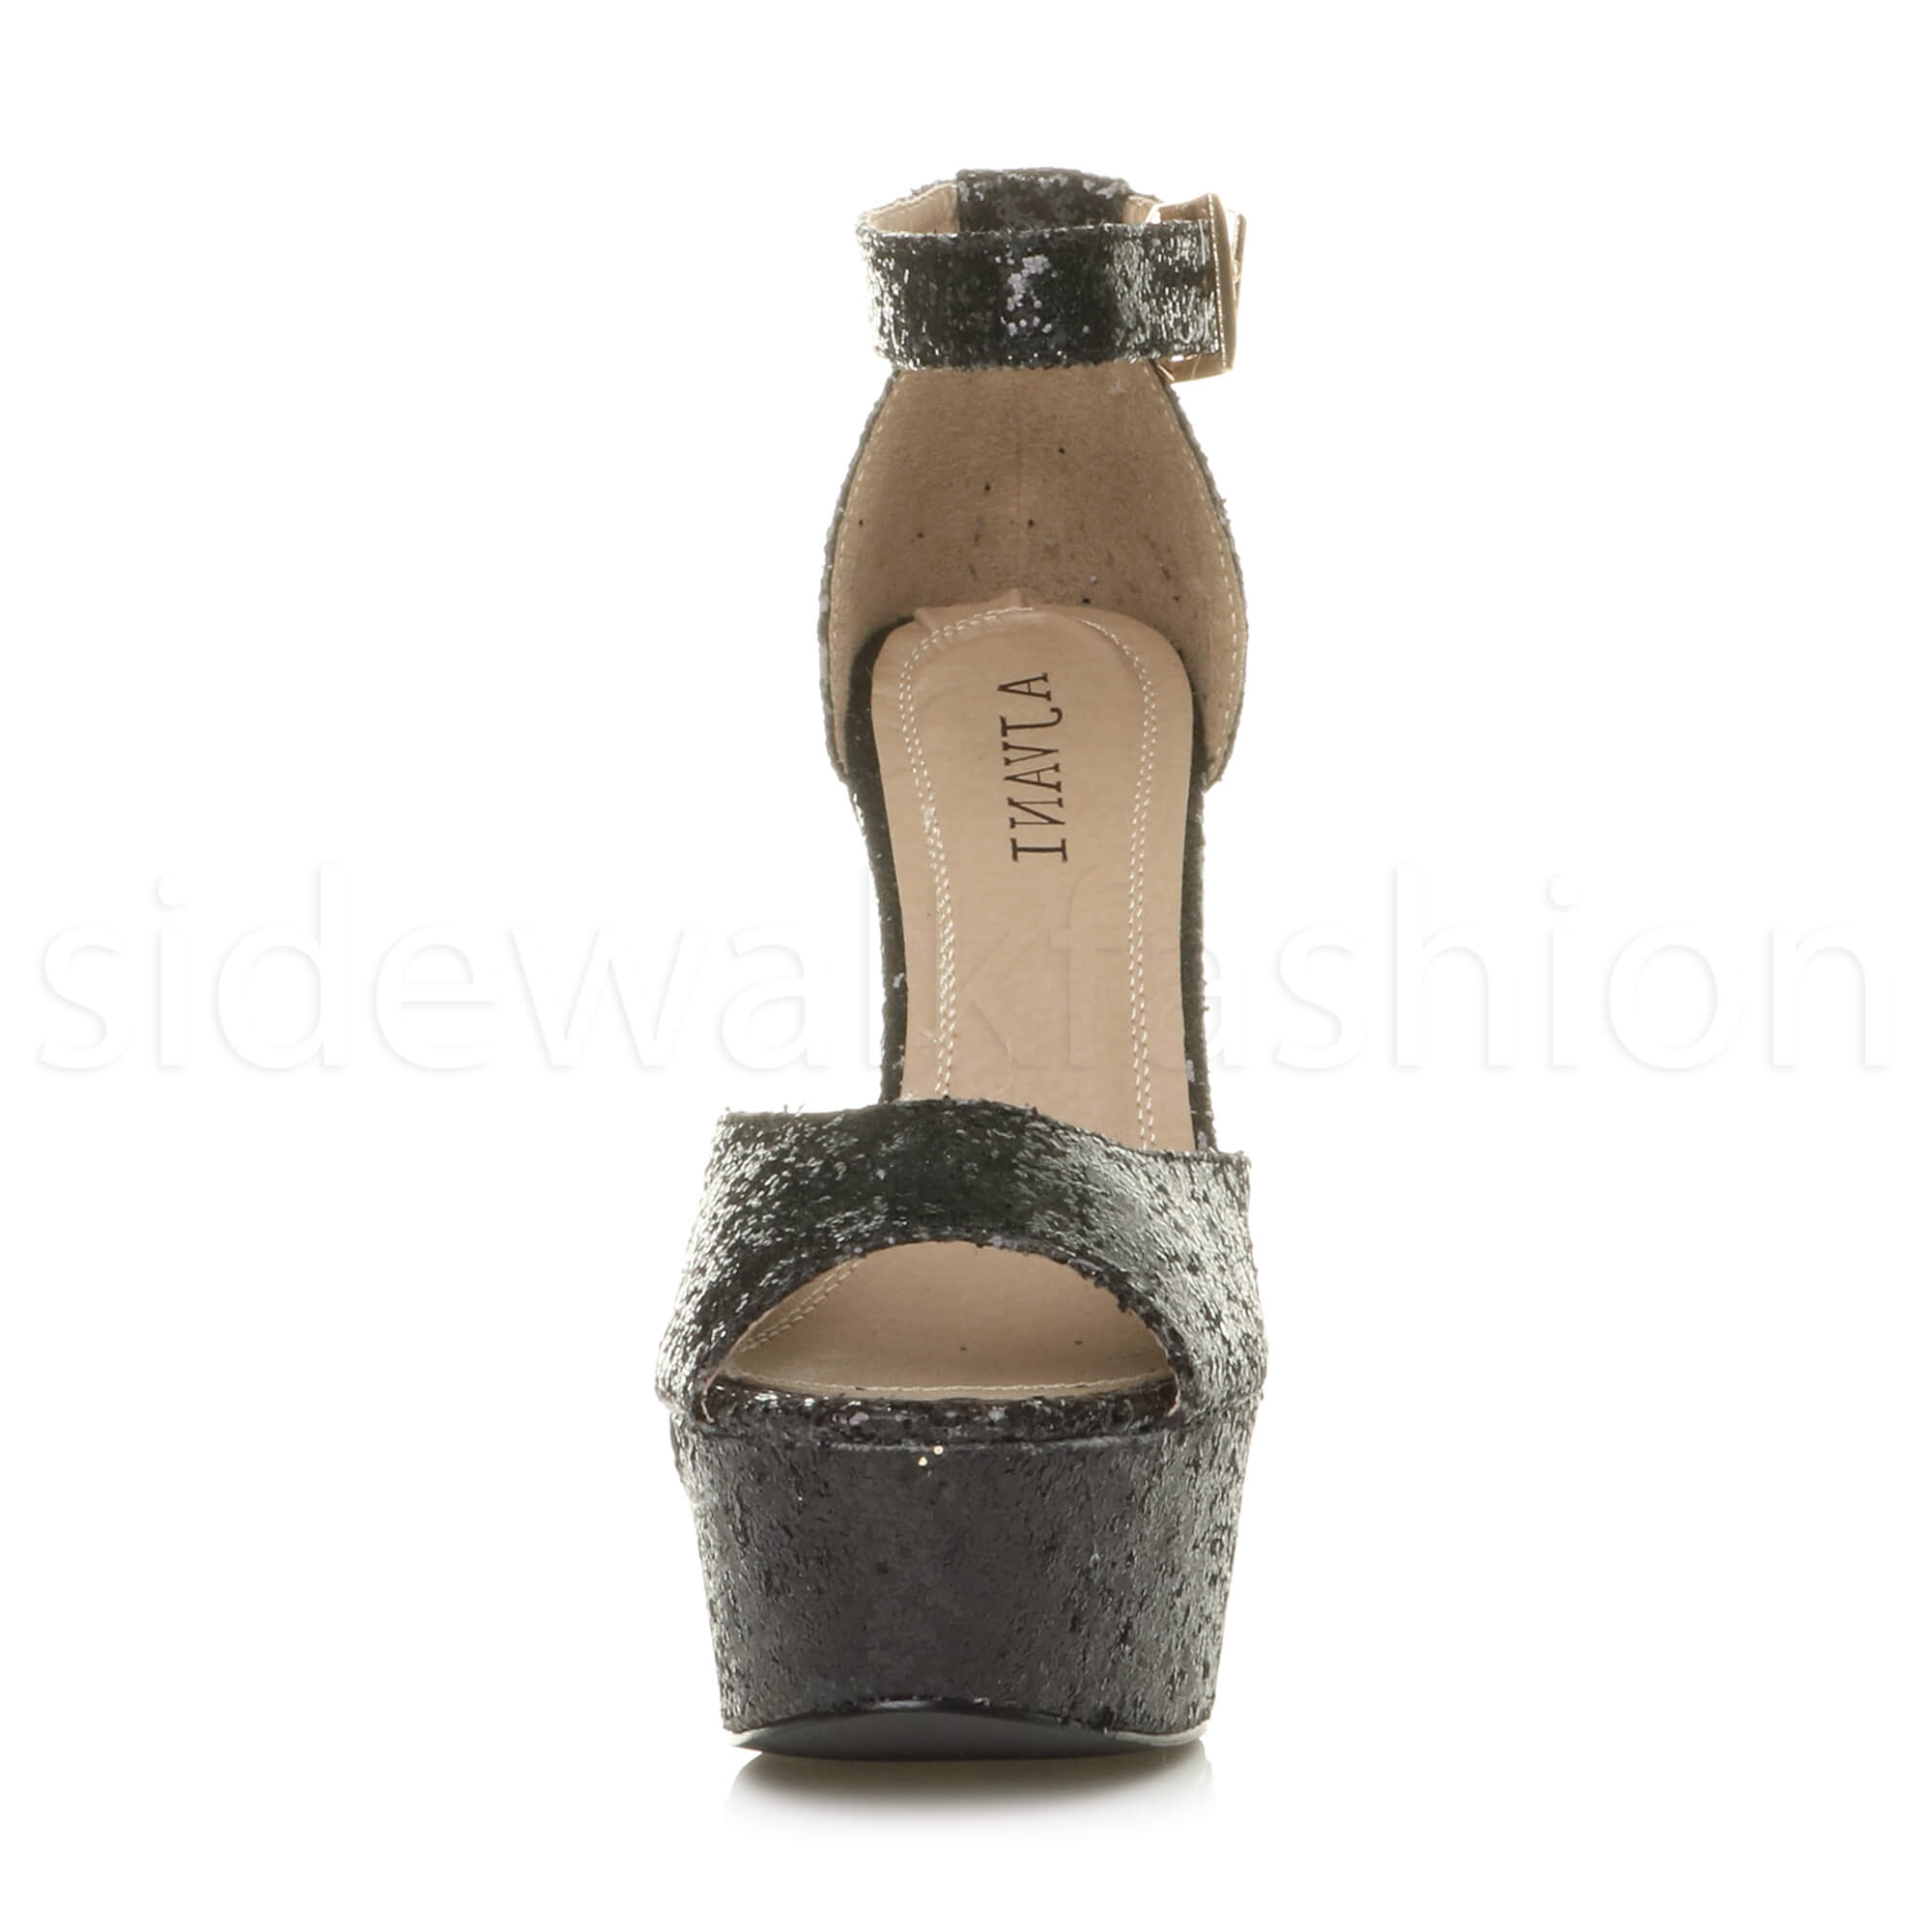 Womens-ladies-high-block-heel-peep-toe-shoes-evening-party-platform-sandals-size thumbnail 6